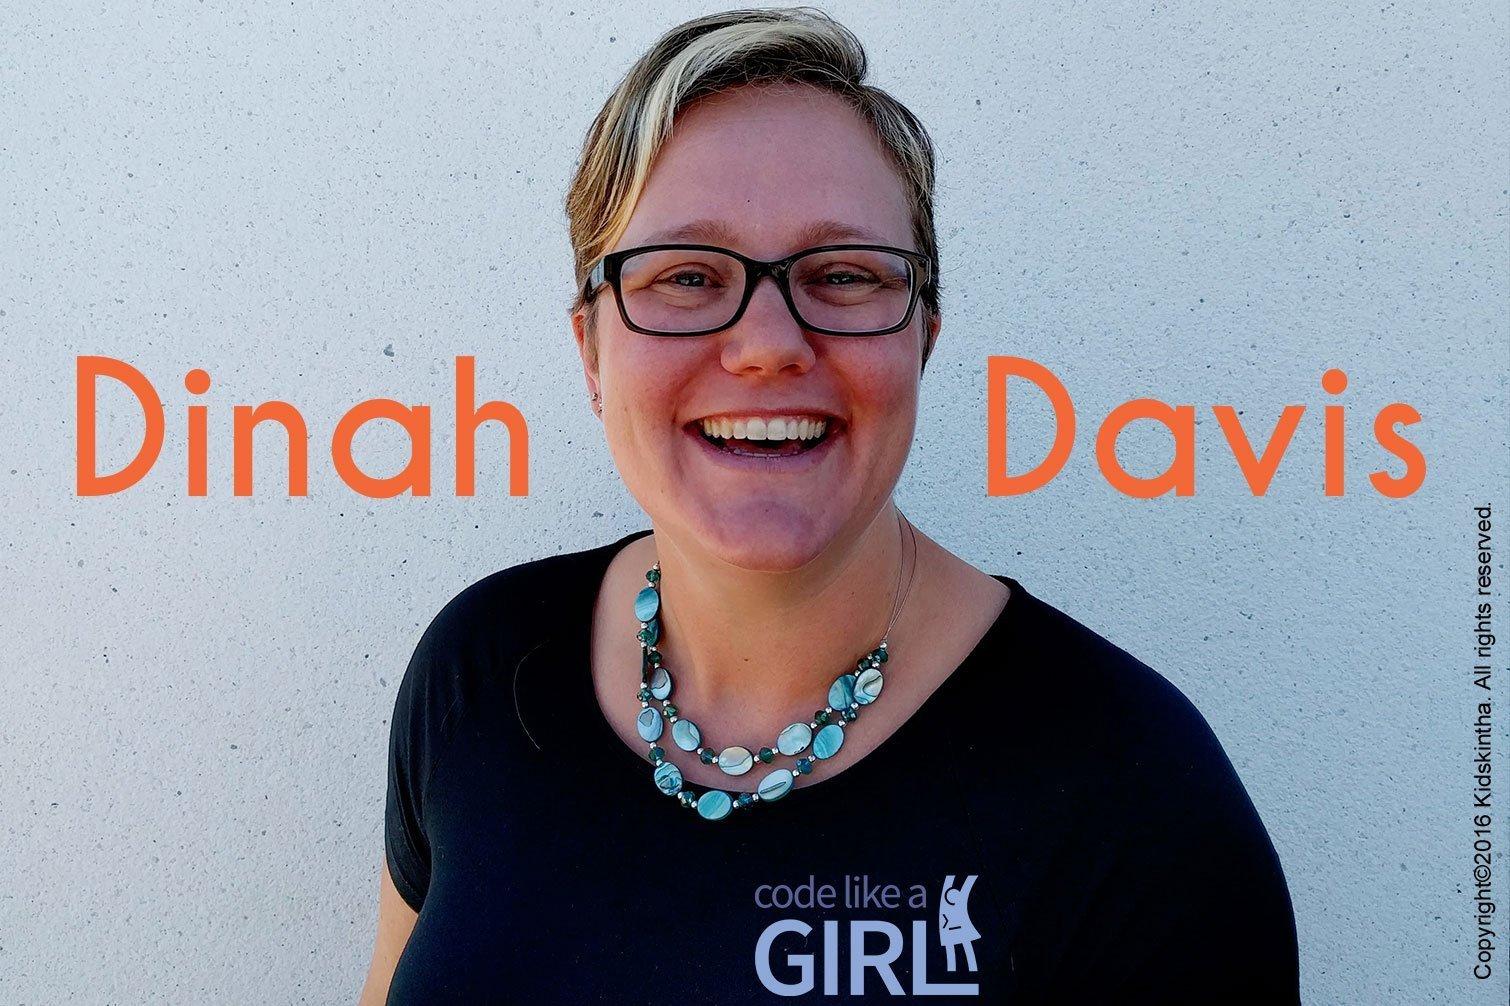 Dinah Davis - Founder, Code Like A Girl